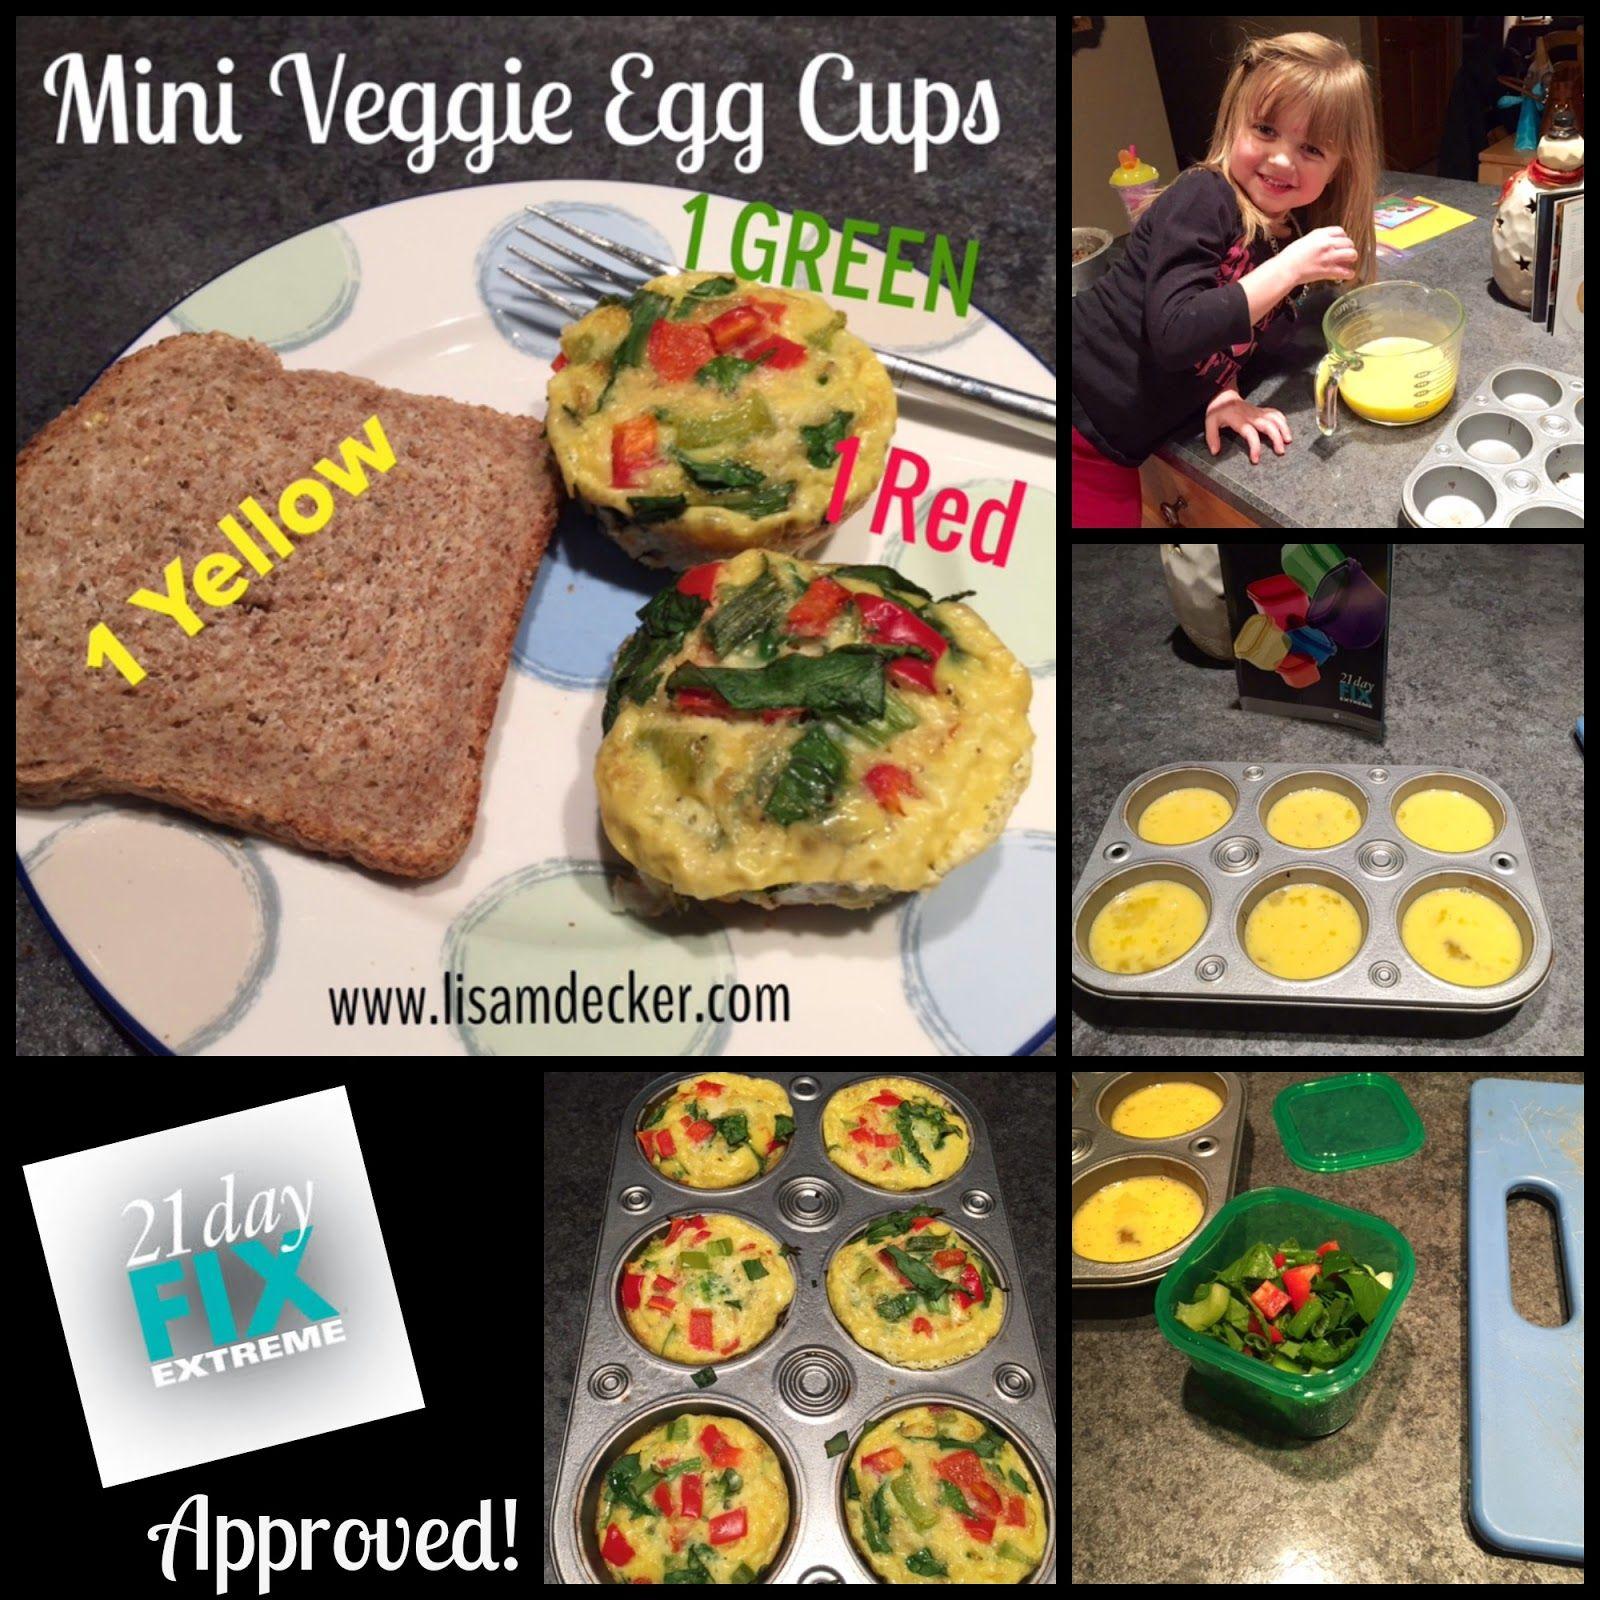 Mini Veggies Egg Cups Egg White Muffins Healthy